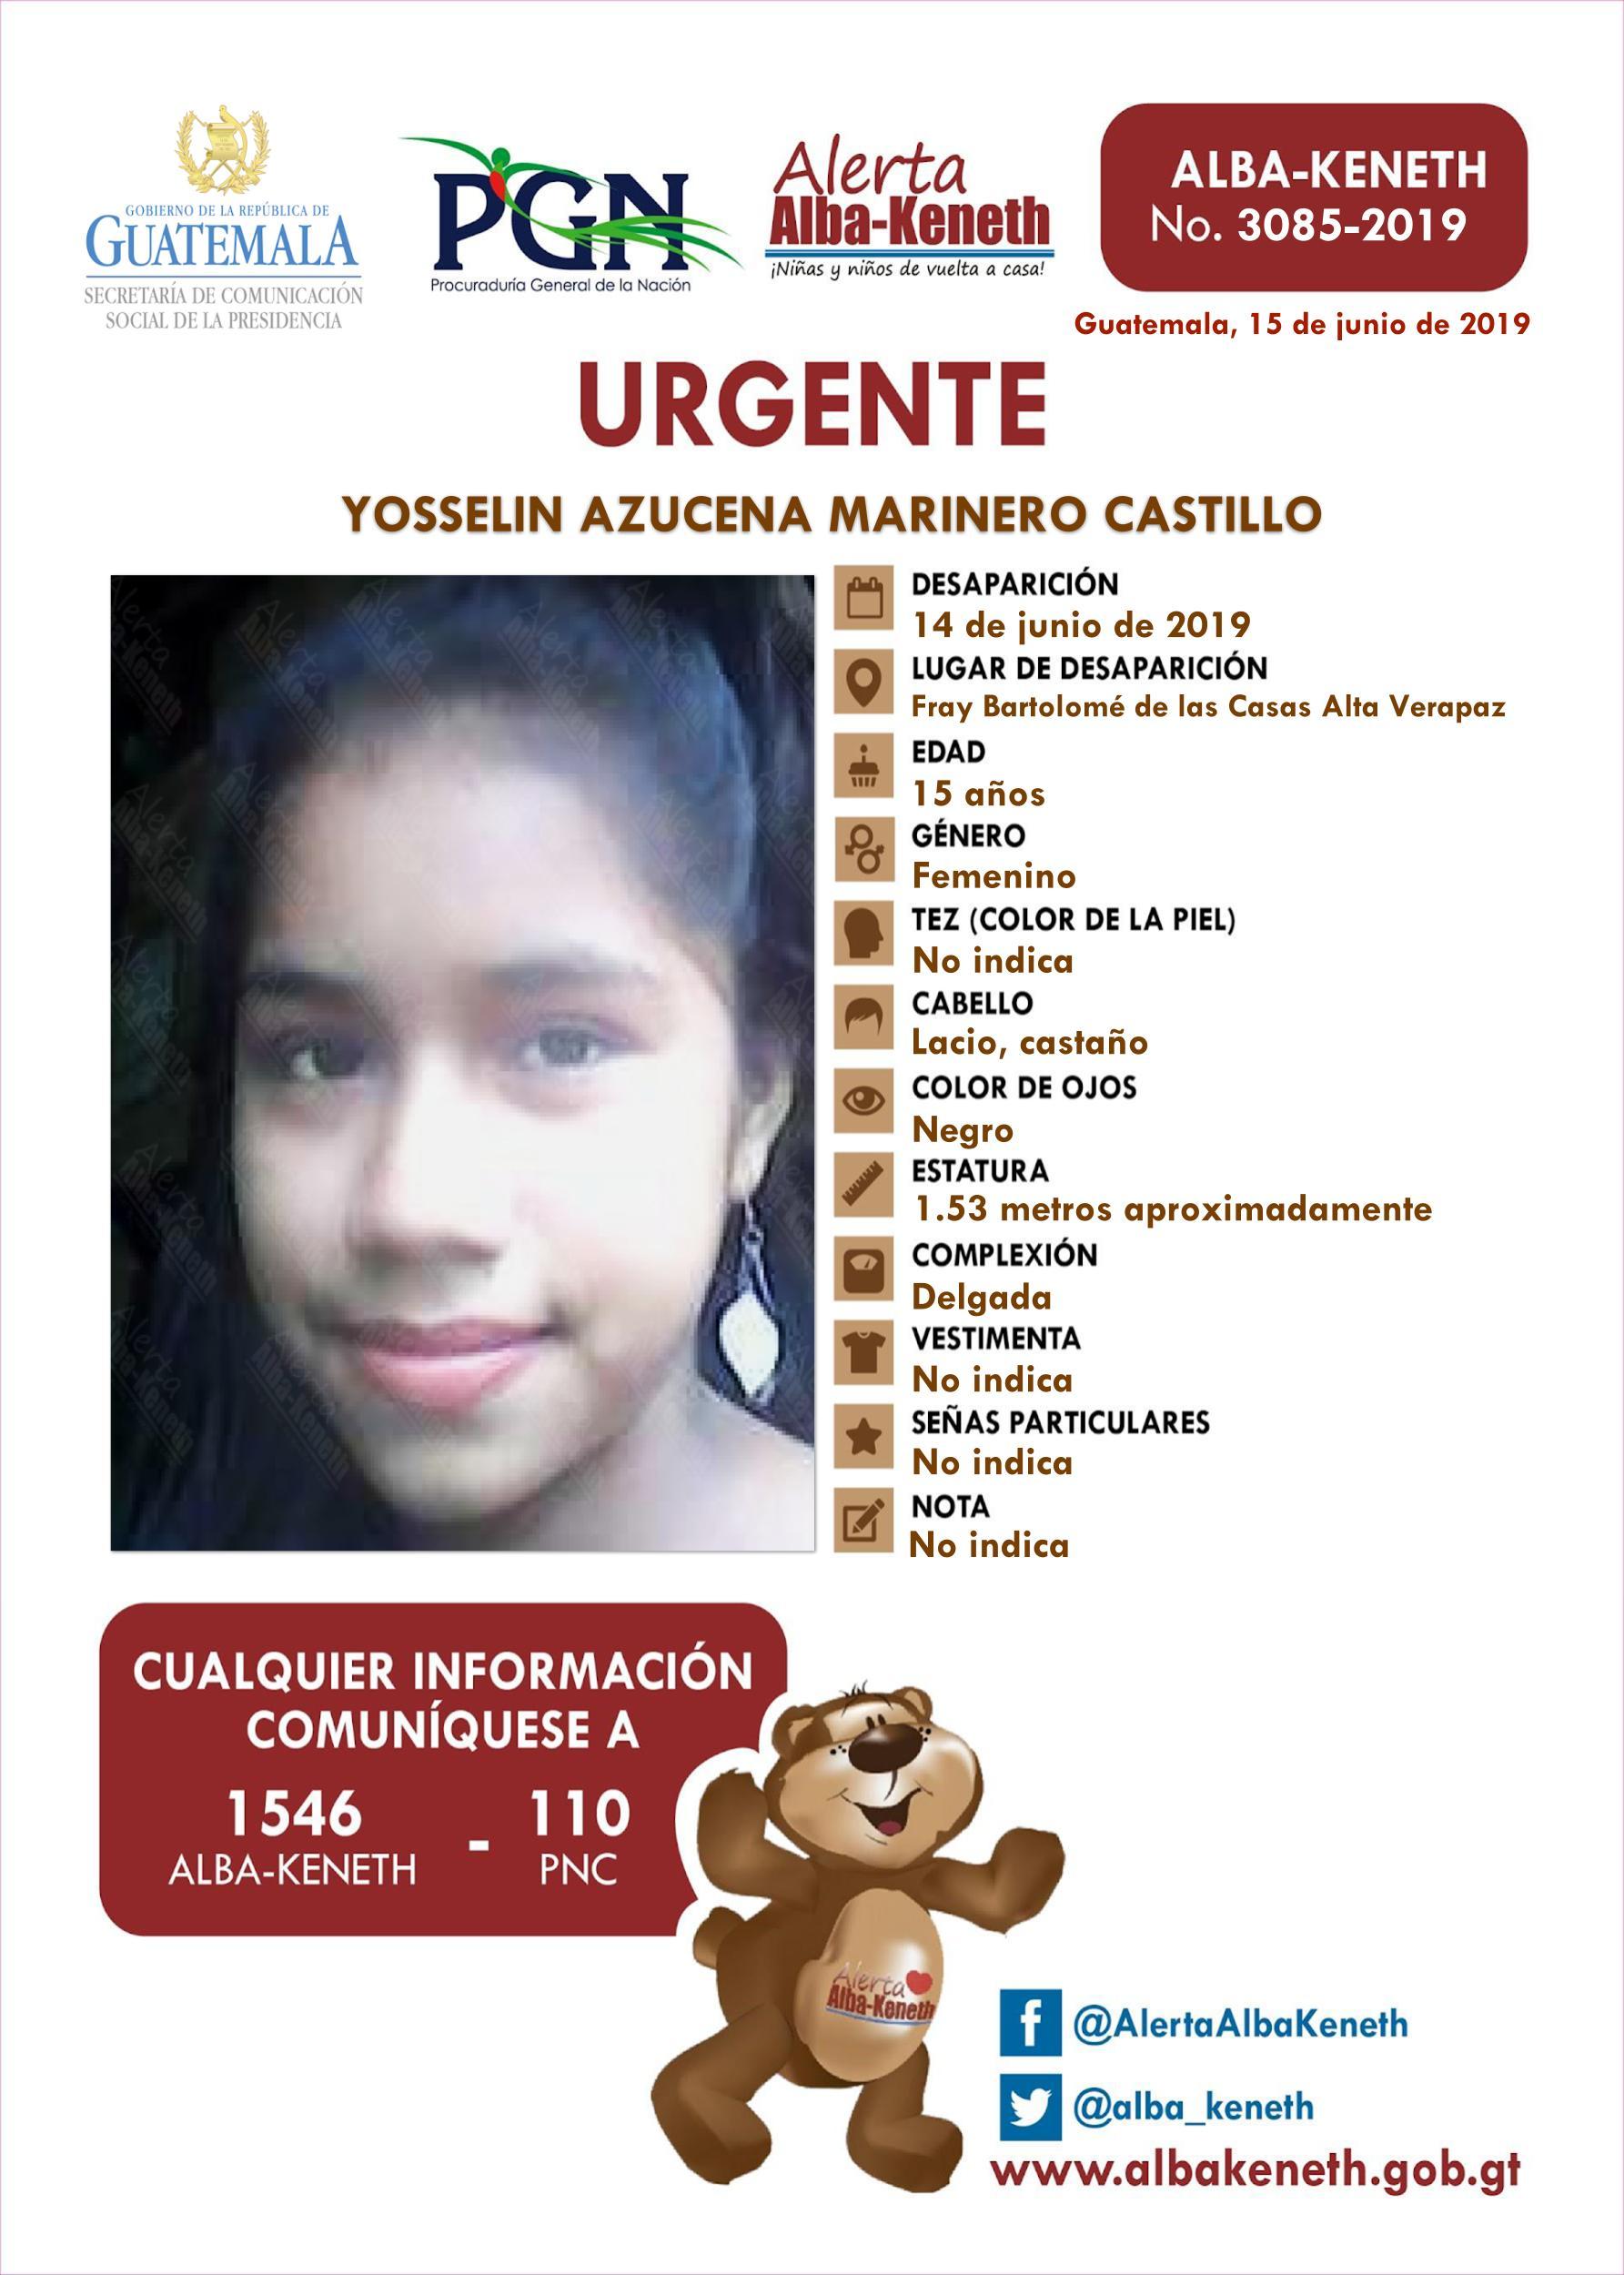 Yosselin Azucena Marinero Castillo